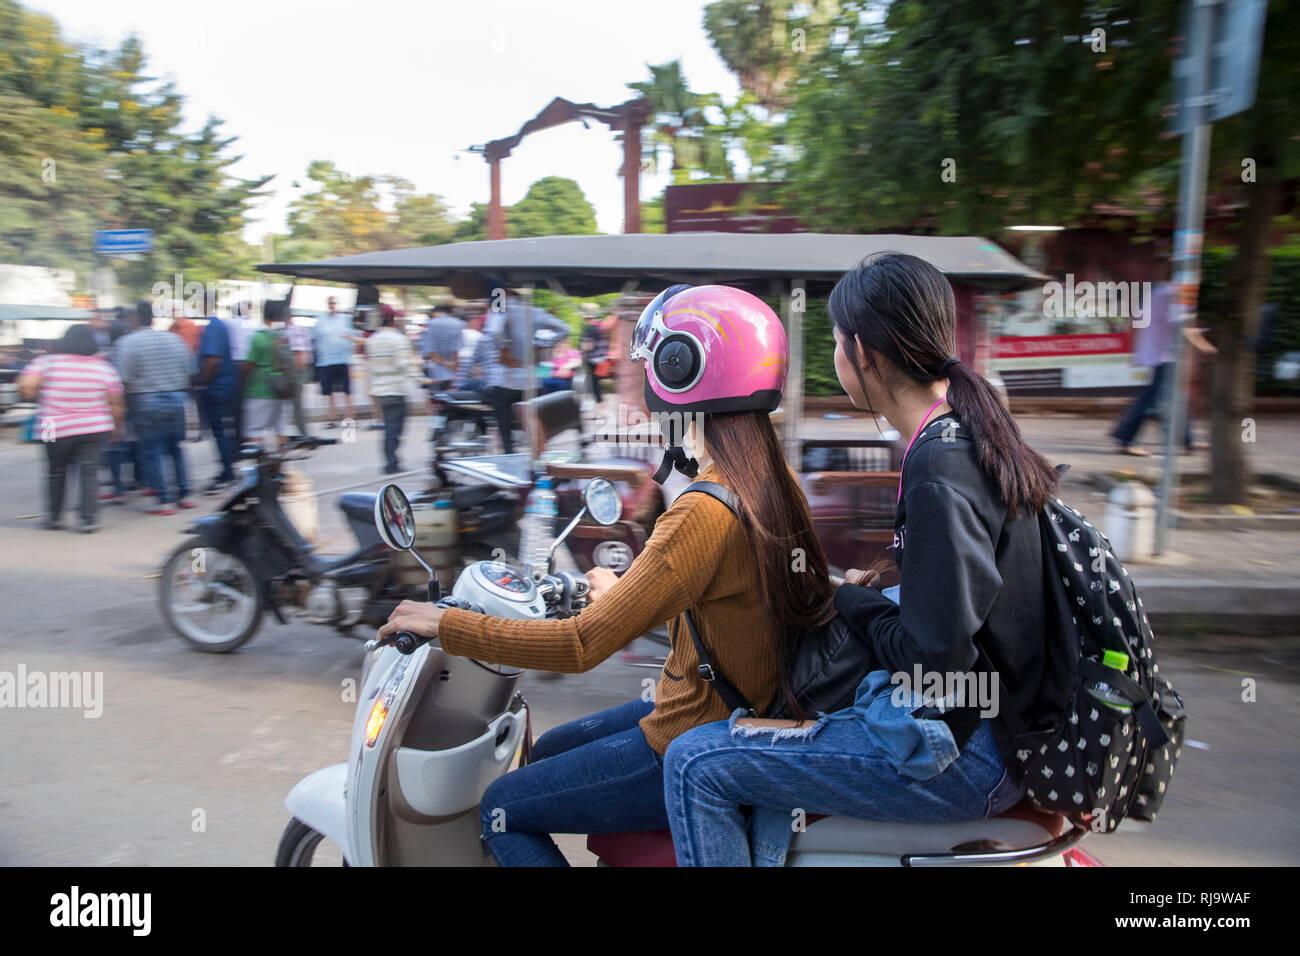 Kambodscha, Phnom Penh, Freundinnen auf einem Mofa Stock Photo